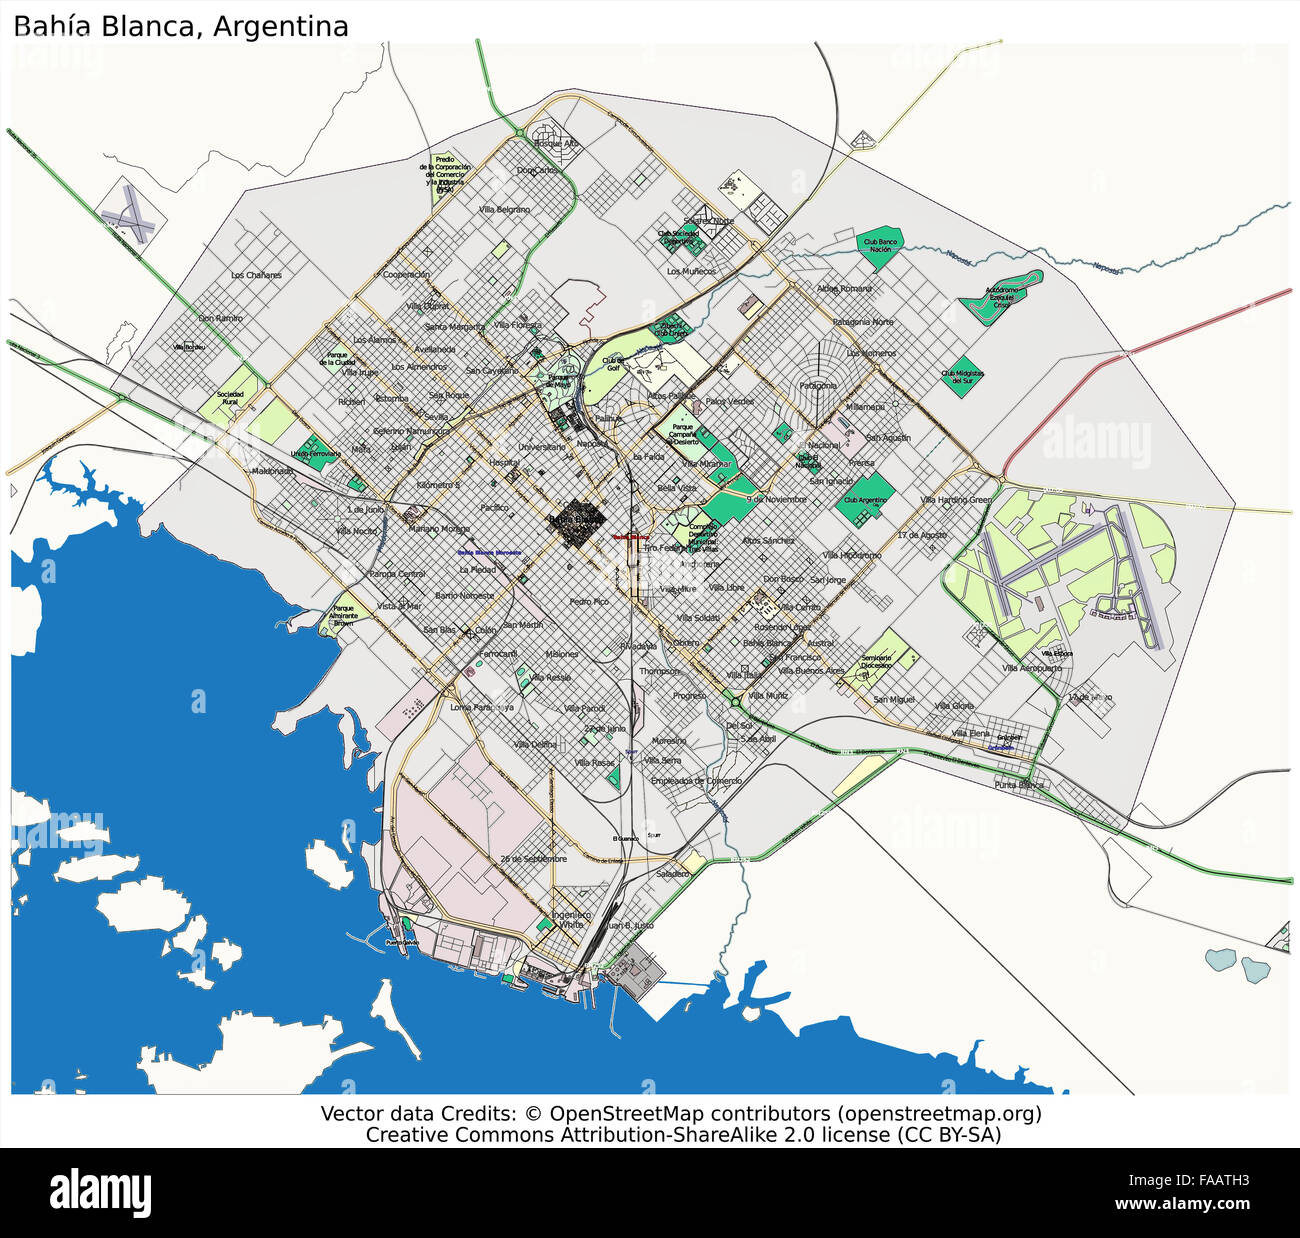 Bahia Blanca Argentina City Map Stock Photo Royalty Free Image - Argentina map bahia blanca